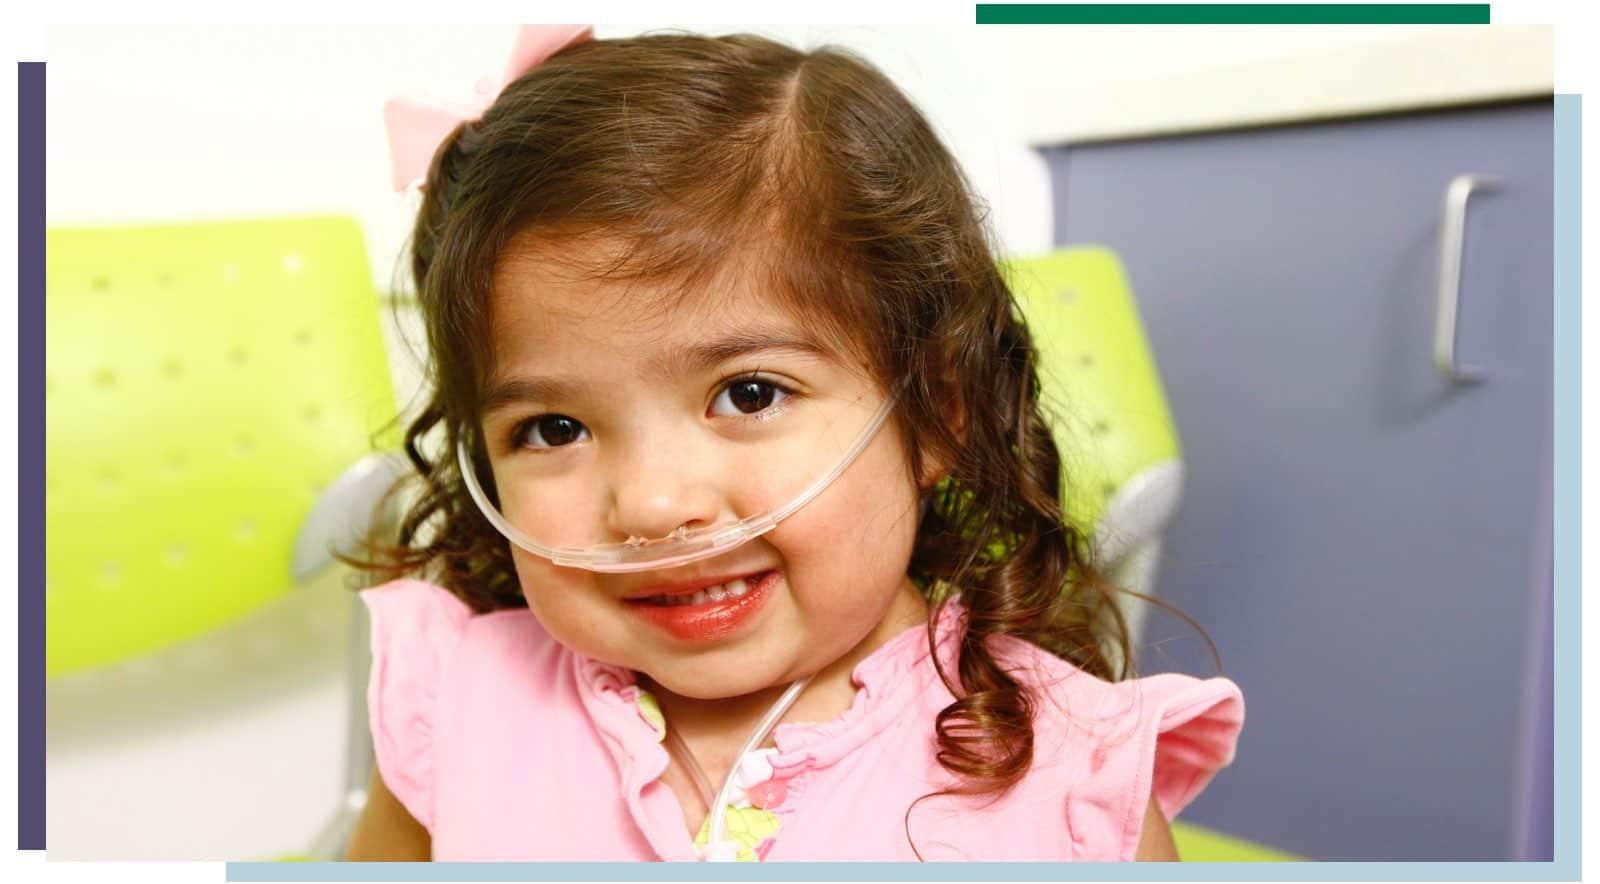 Bringing pediatric cardiac surgery closer to home